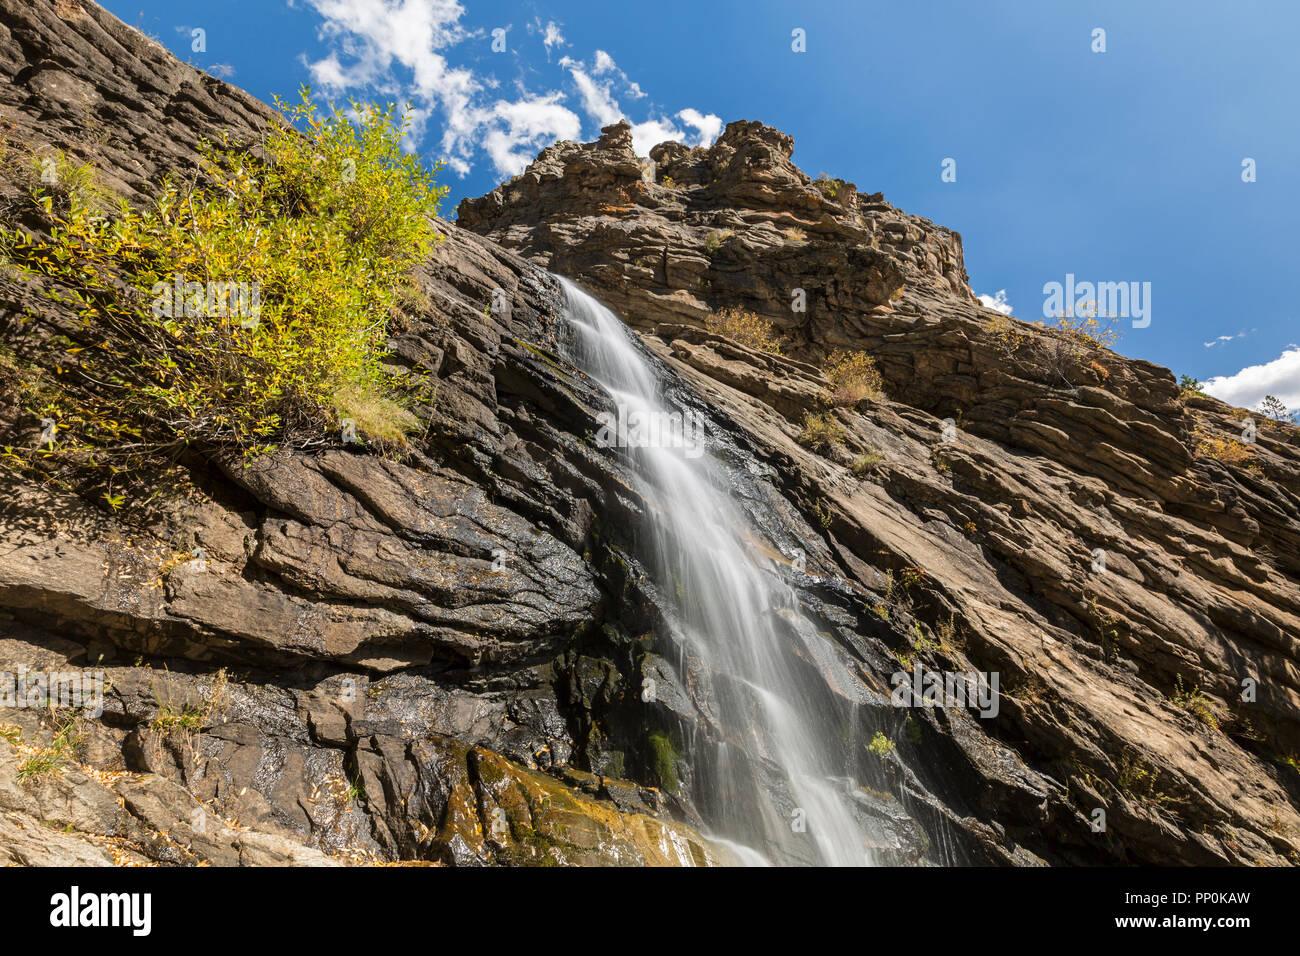 Bridal Veil Falls on Cow Creek in Rocky Mountain National Park, Estes Park, Colorado. - Stock Image